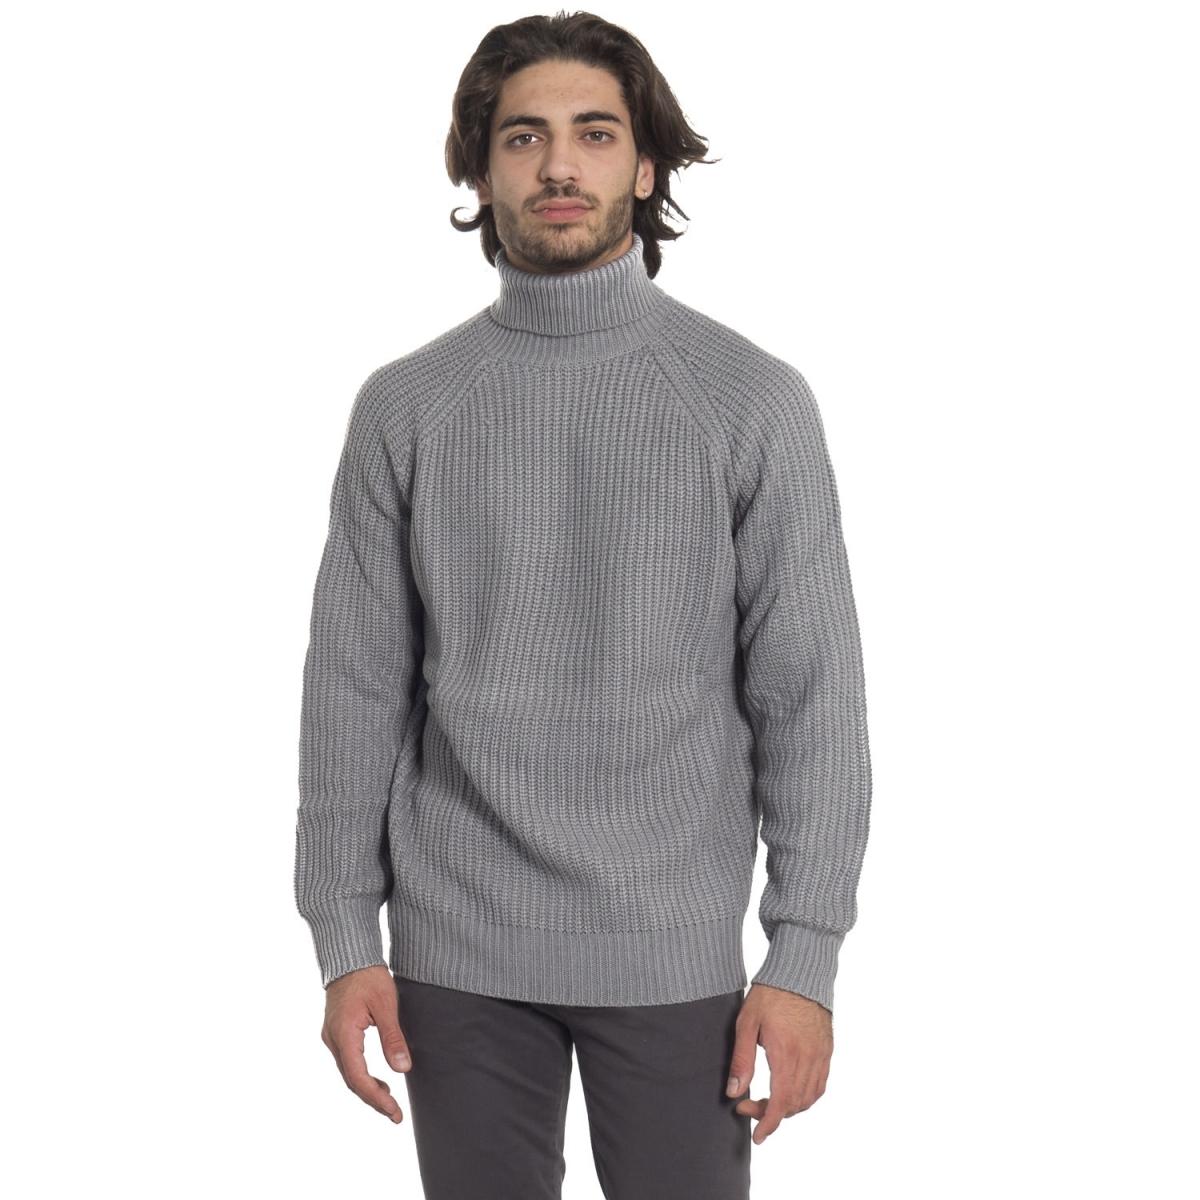 clothing Knitwears men Maglia LPATA308 LANDEK PARK Cafedelmar Shop